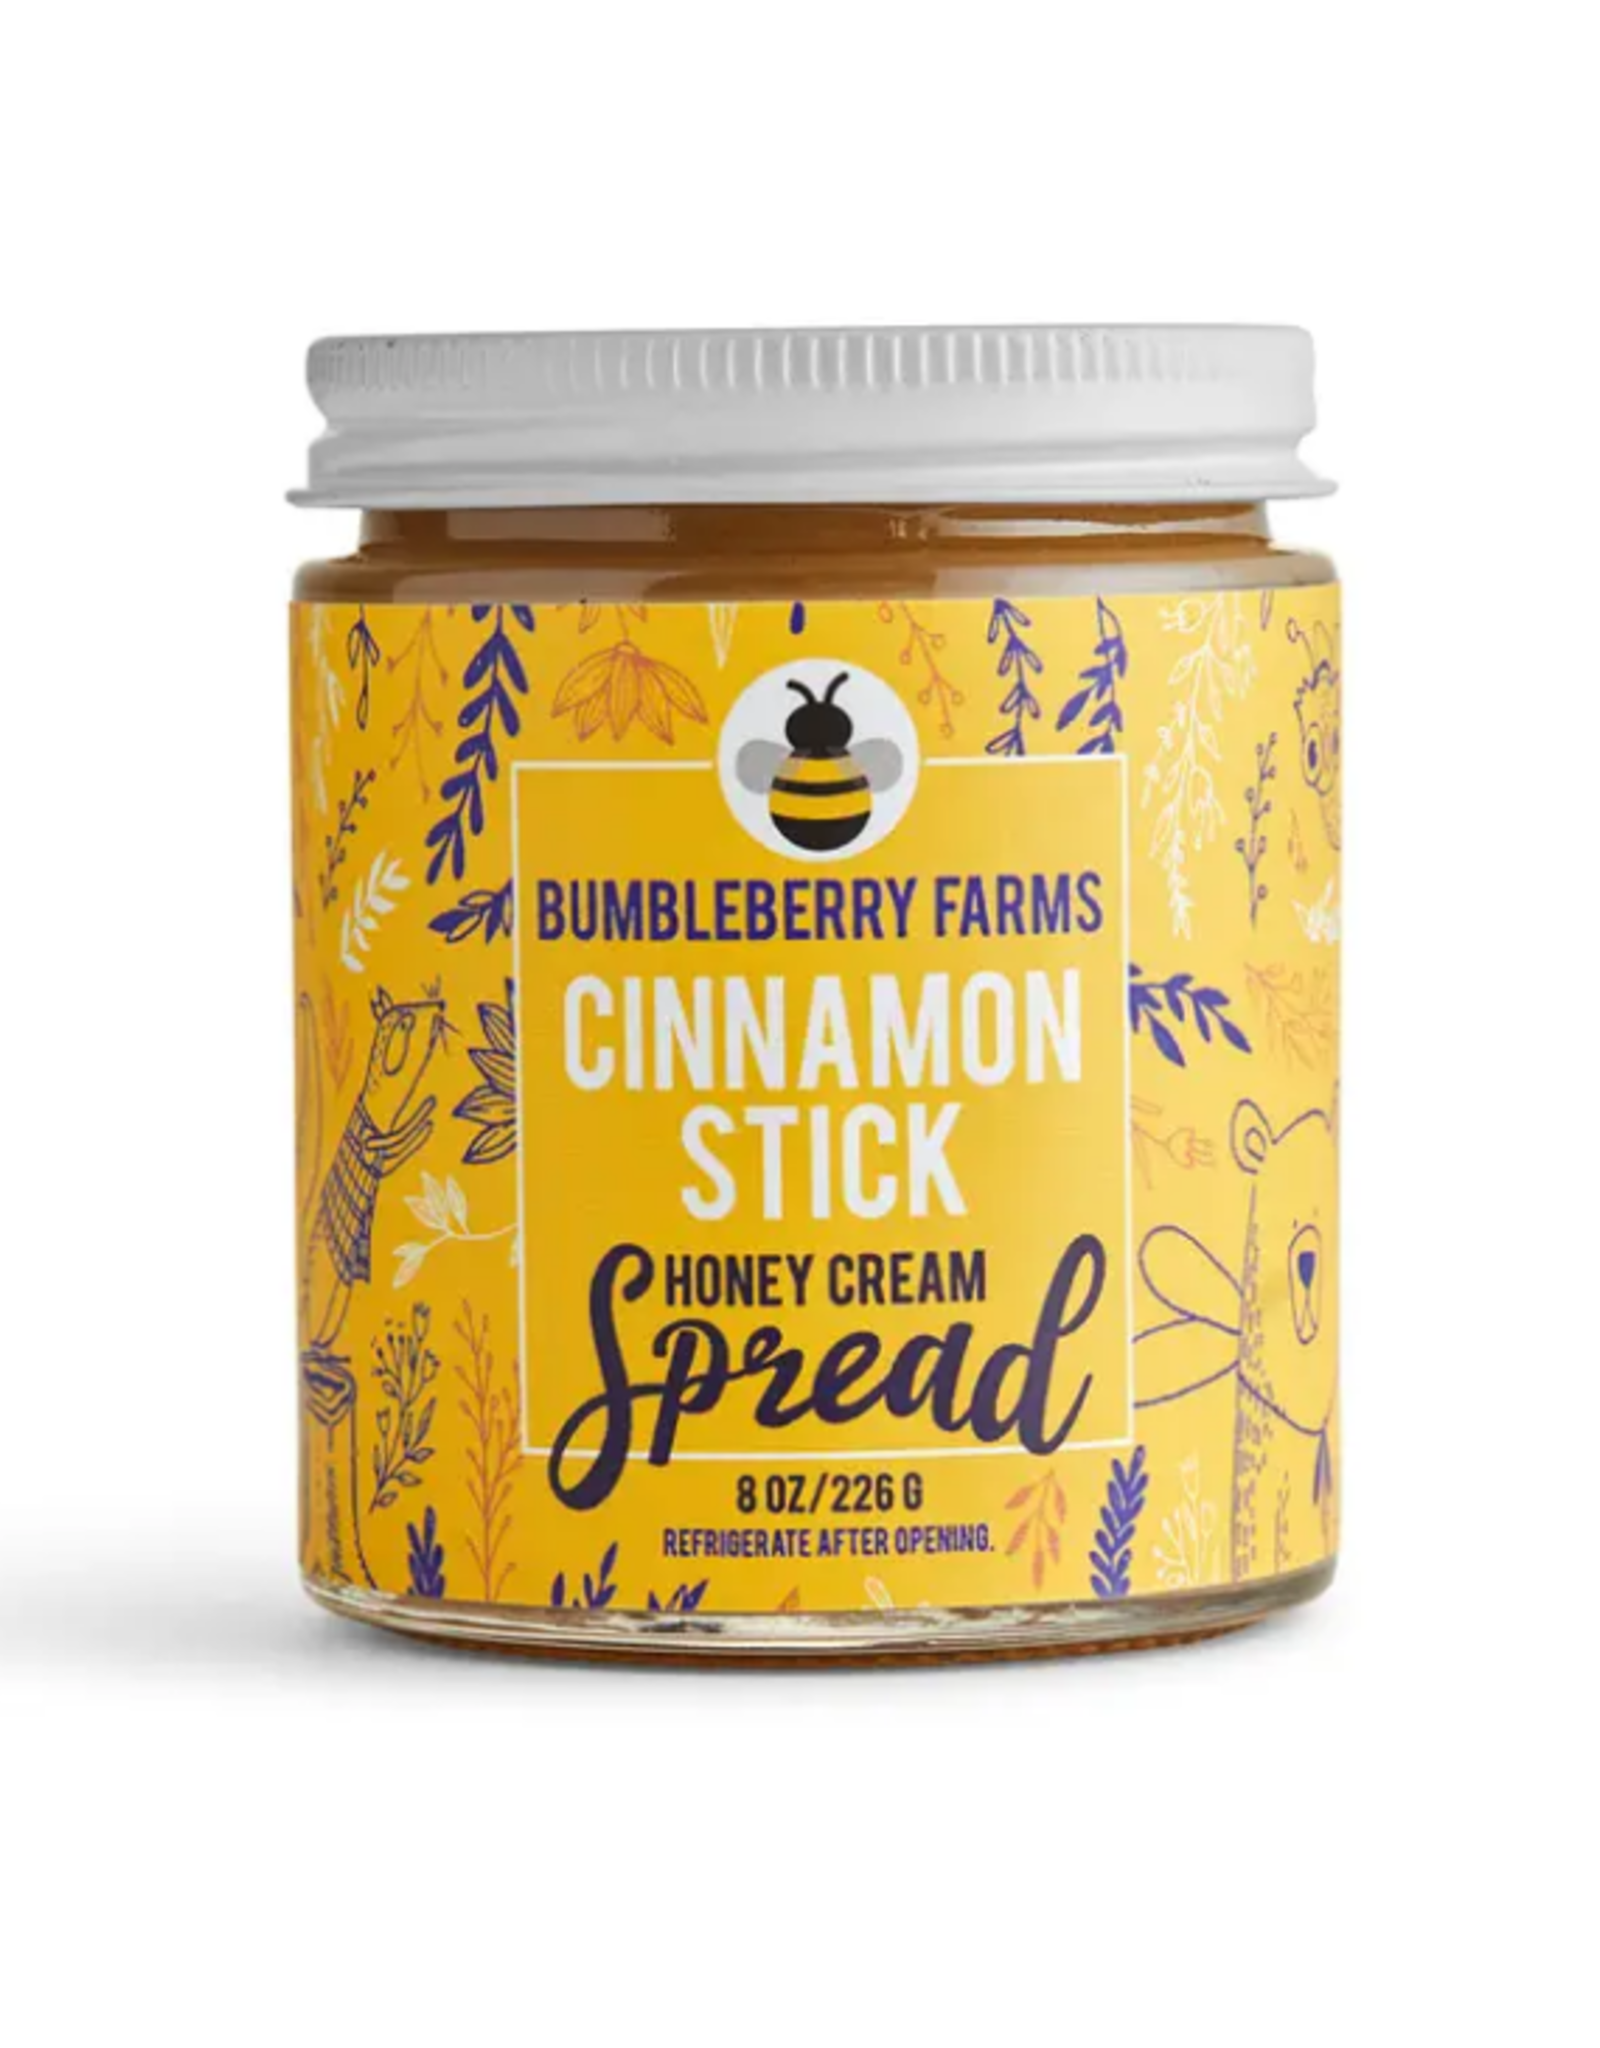 Bumbleberry Farms Cinnamon Stick Honey Cream Spread